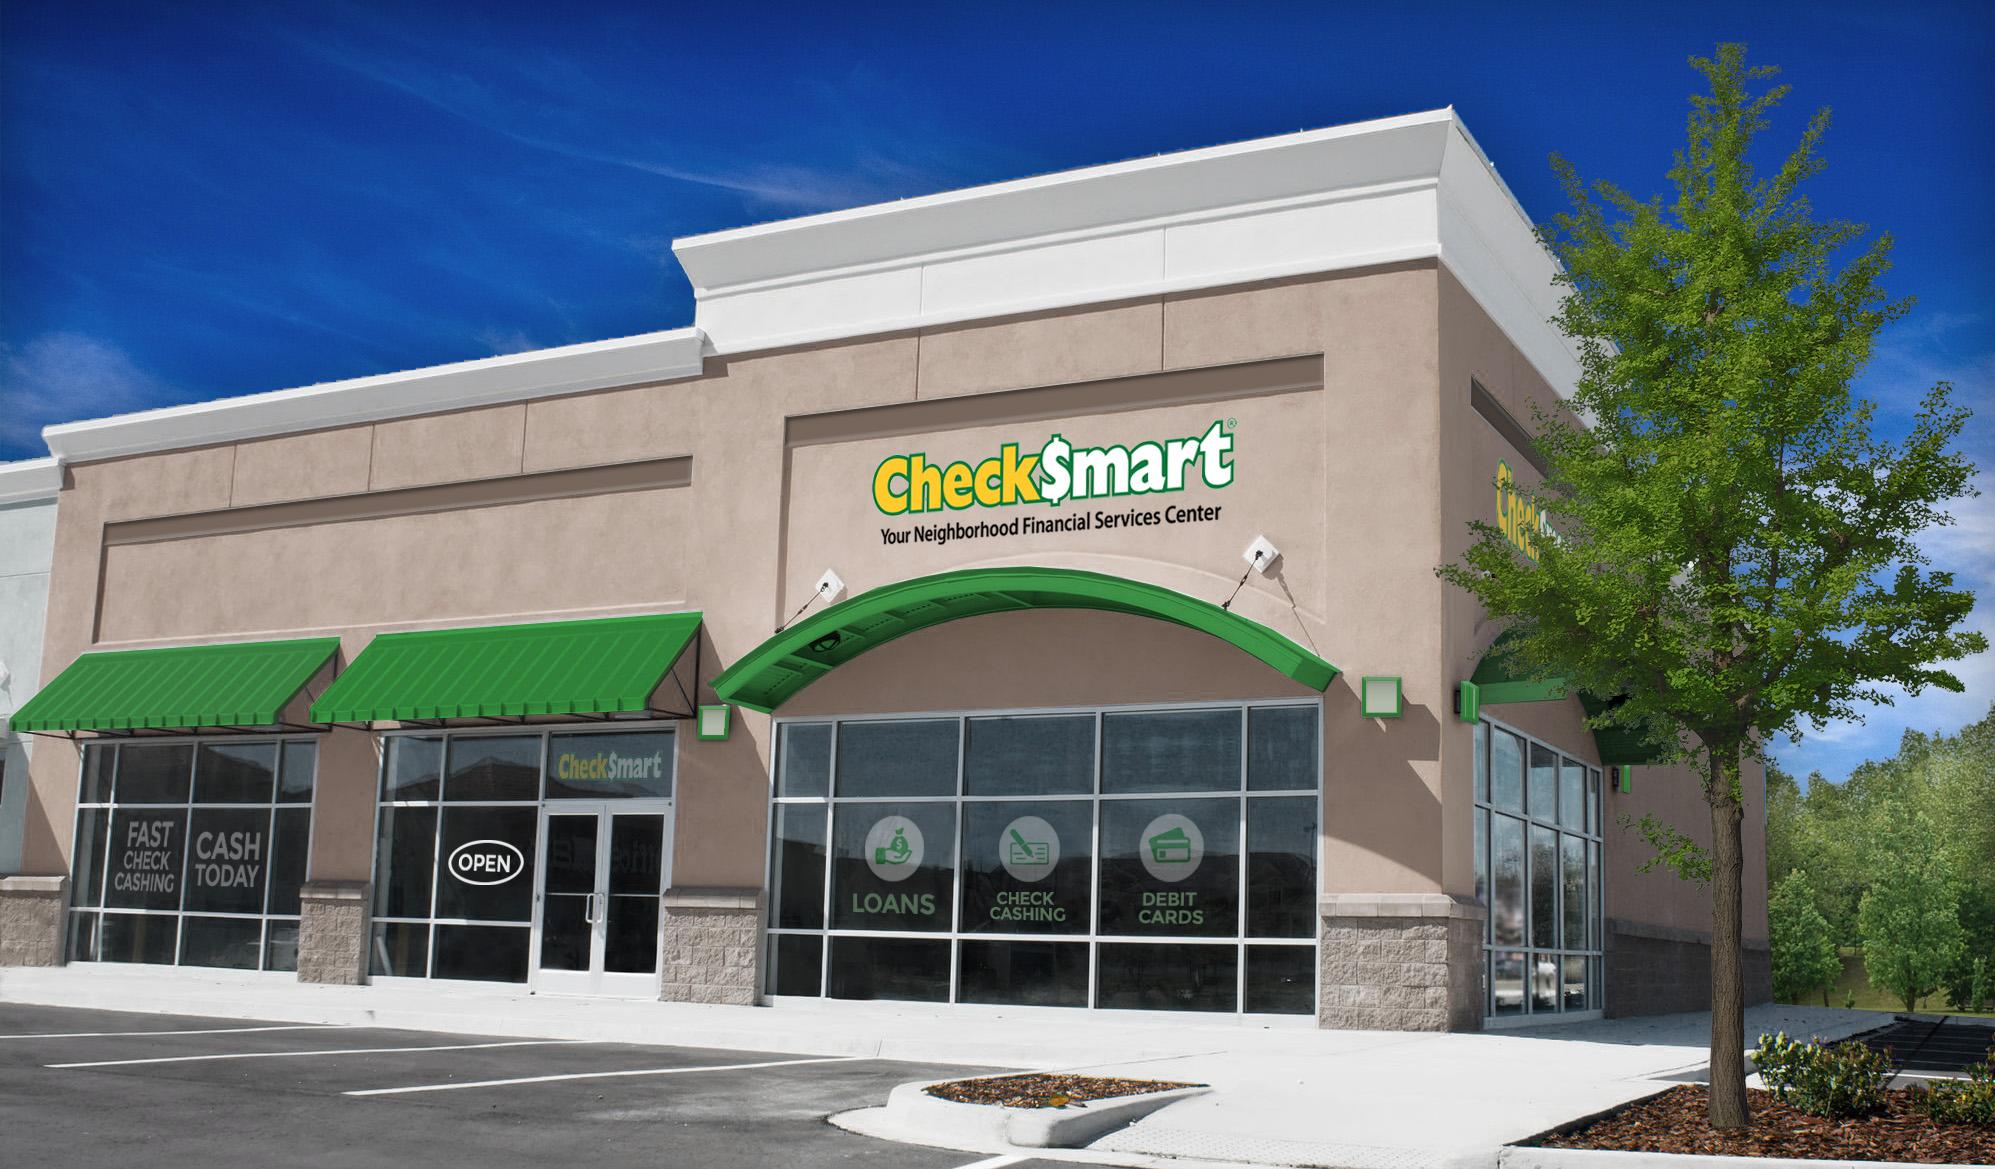 checksmartstore